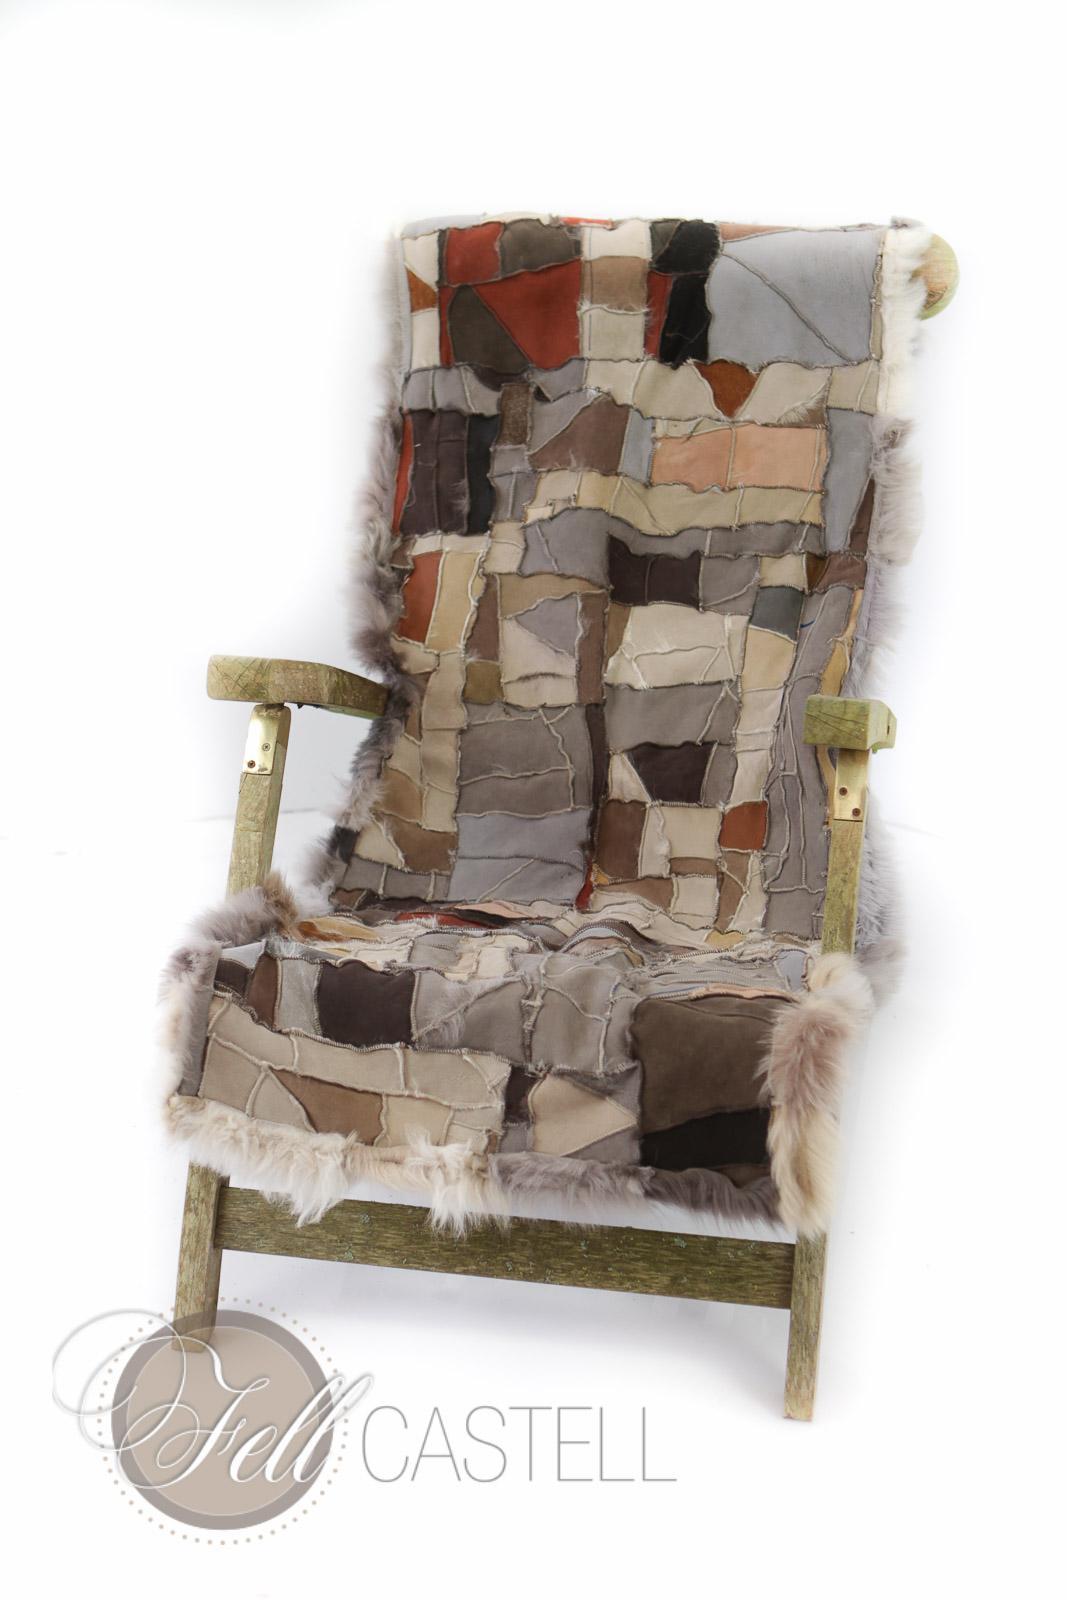 kleine Lammfell Decke 155x55 cm Multicolor Patchwork Rückseite Leder Lammfellteppich